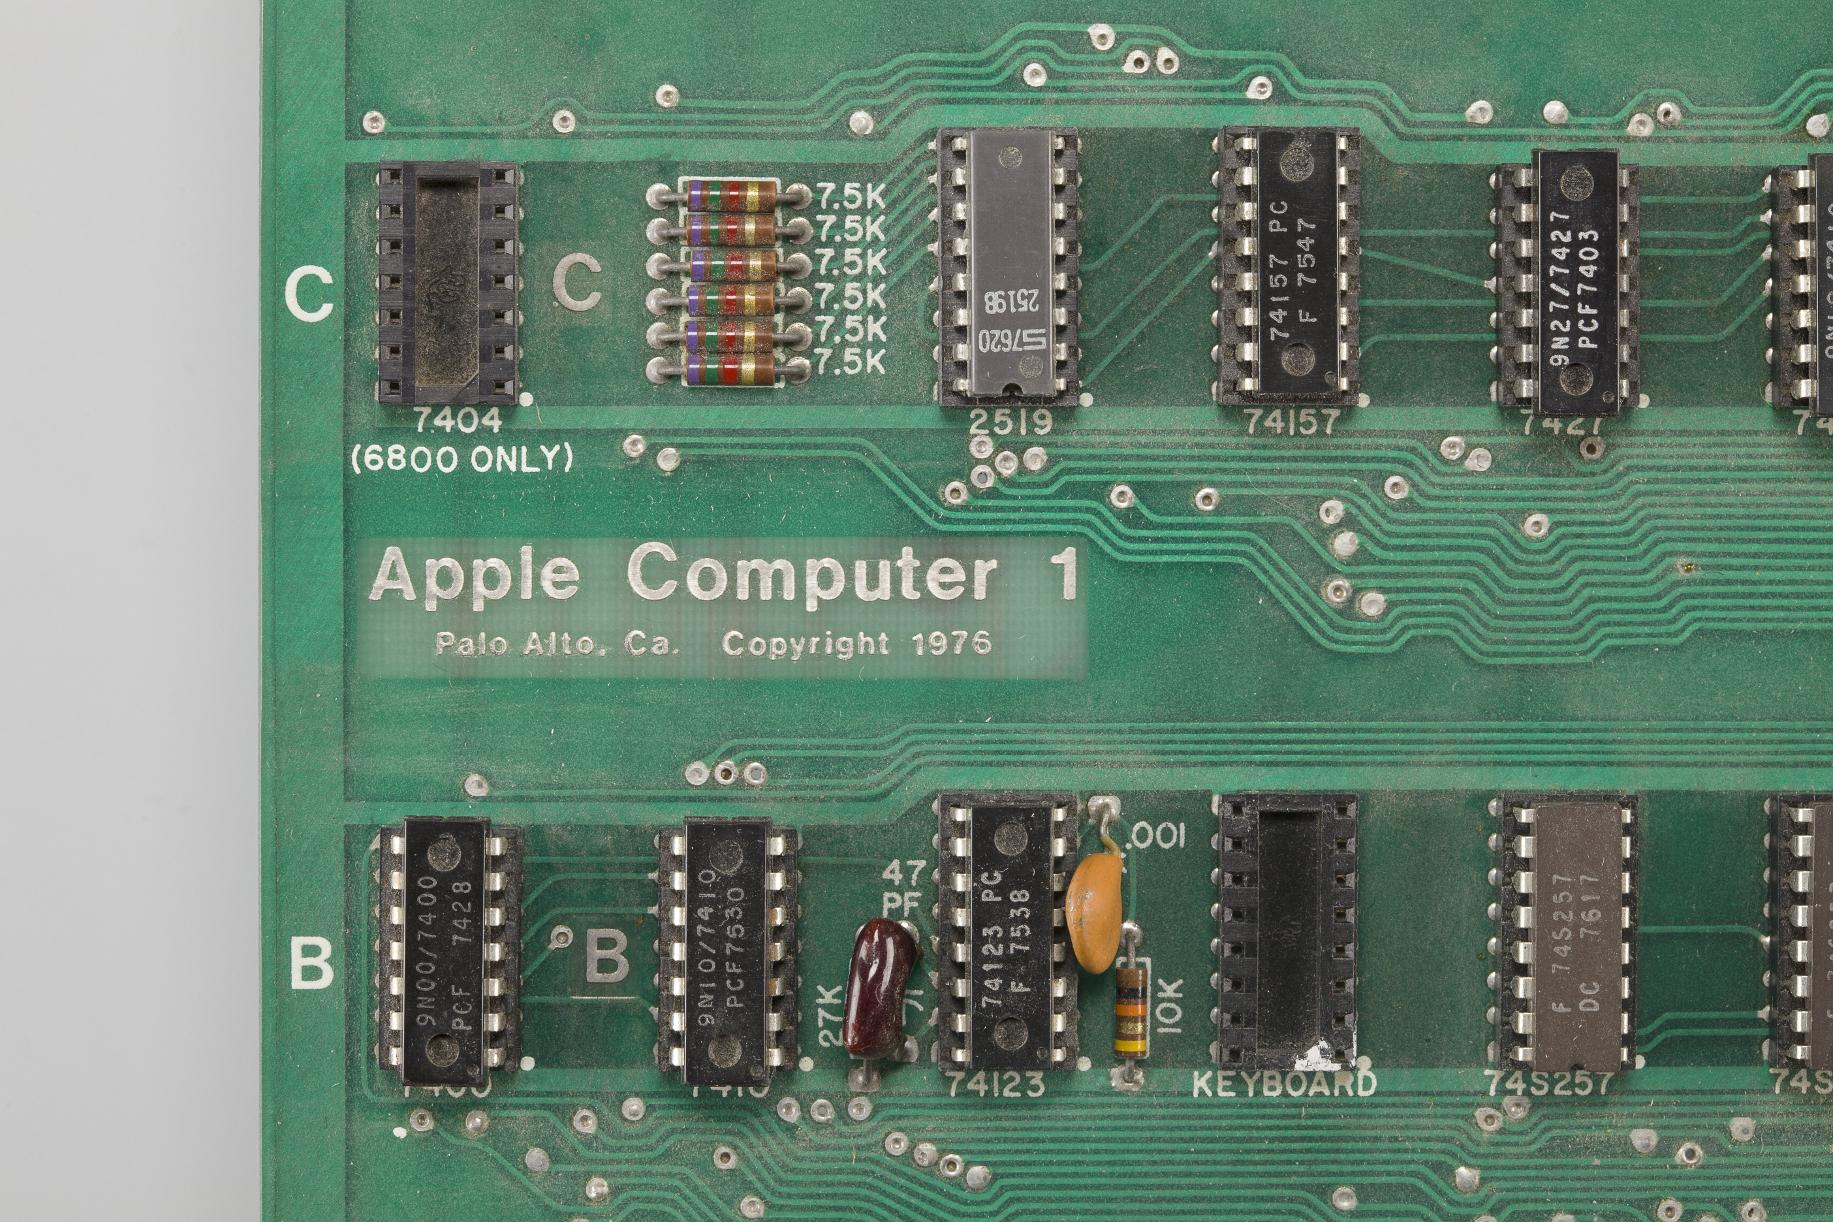 Apple 1 motherboard